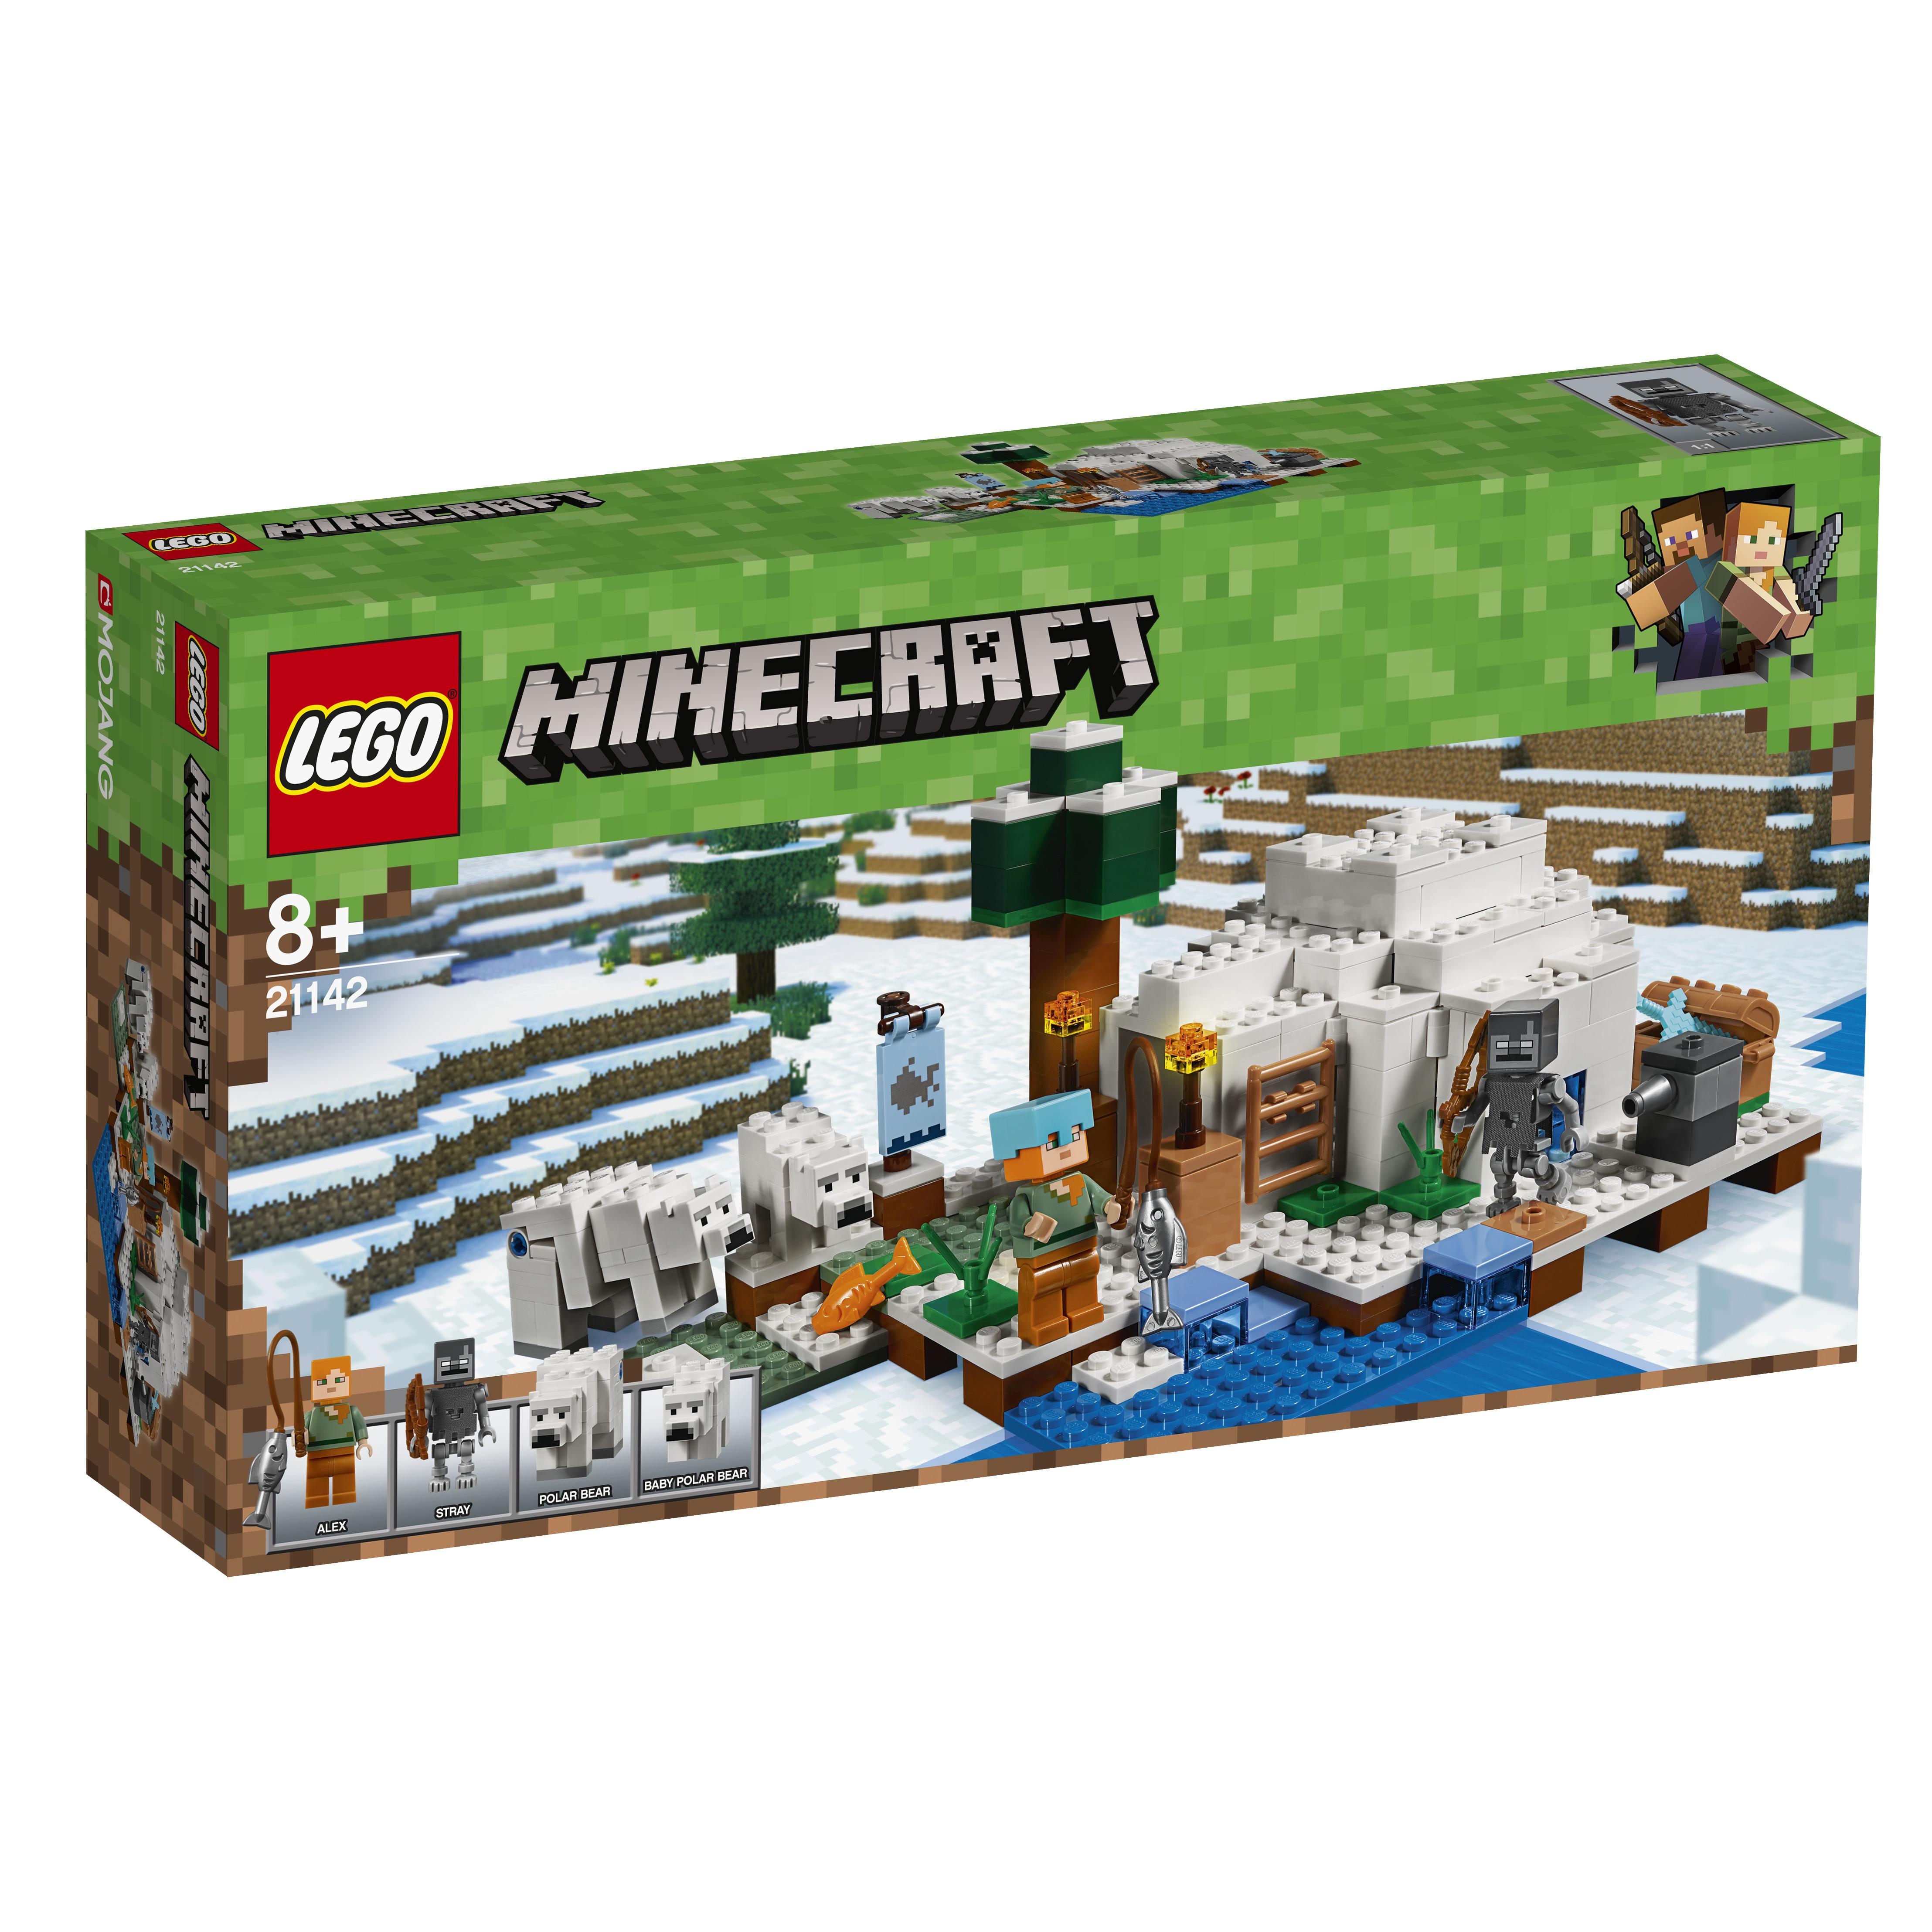 Конструктор LEGO Minecraft 21142 Иглу конструктор lego minecraft skeleton bigfig with magma cube 142 дет 21150